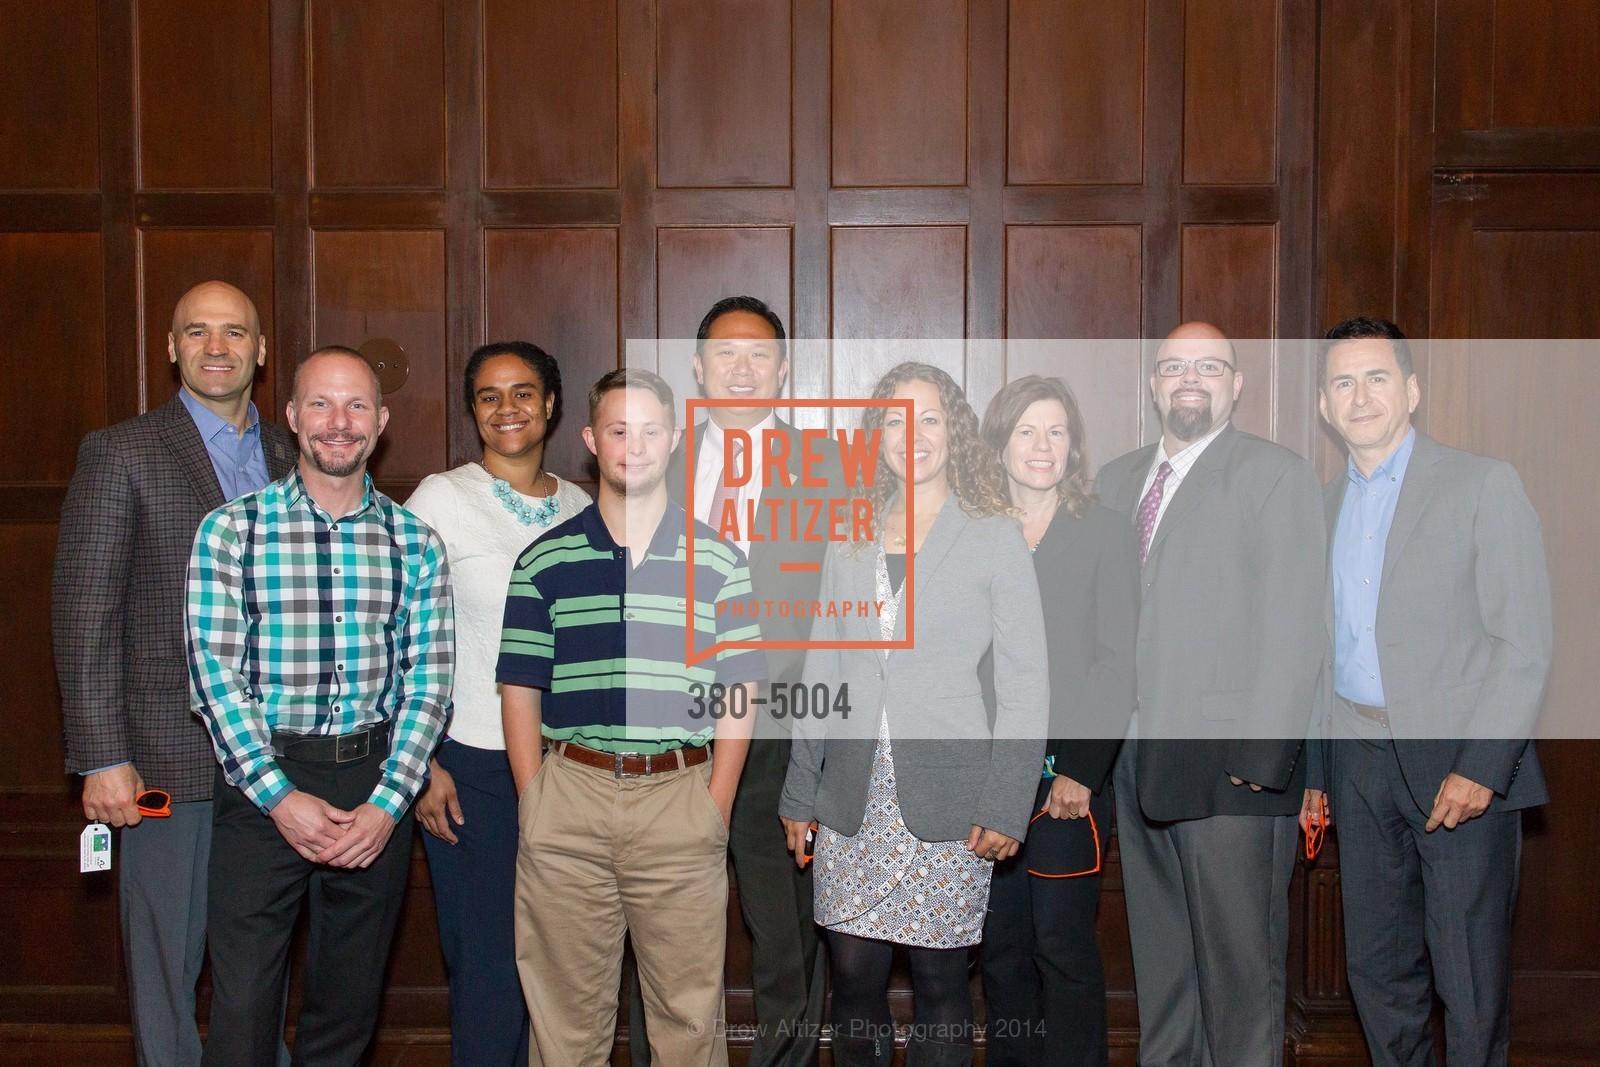 Michael Costanzo, Leah Bandermei, Jackson Soderquist, Ike Kwon, Elayne Graylow, Raul DelBarco, Photo #380-5004